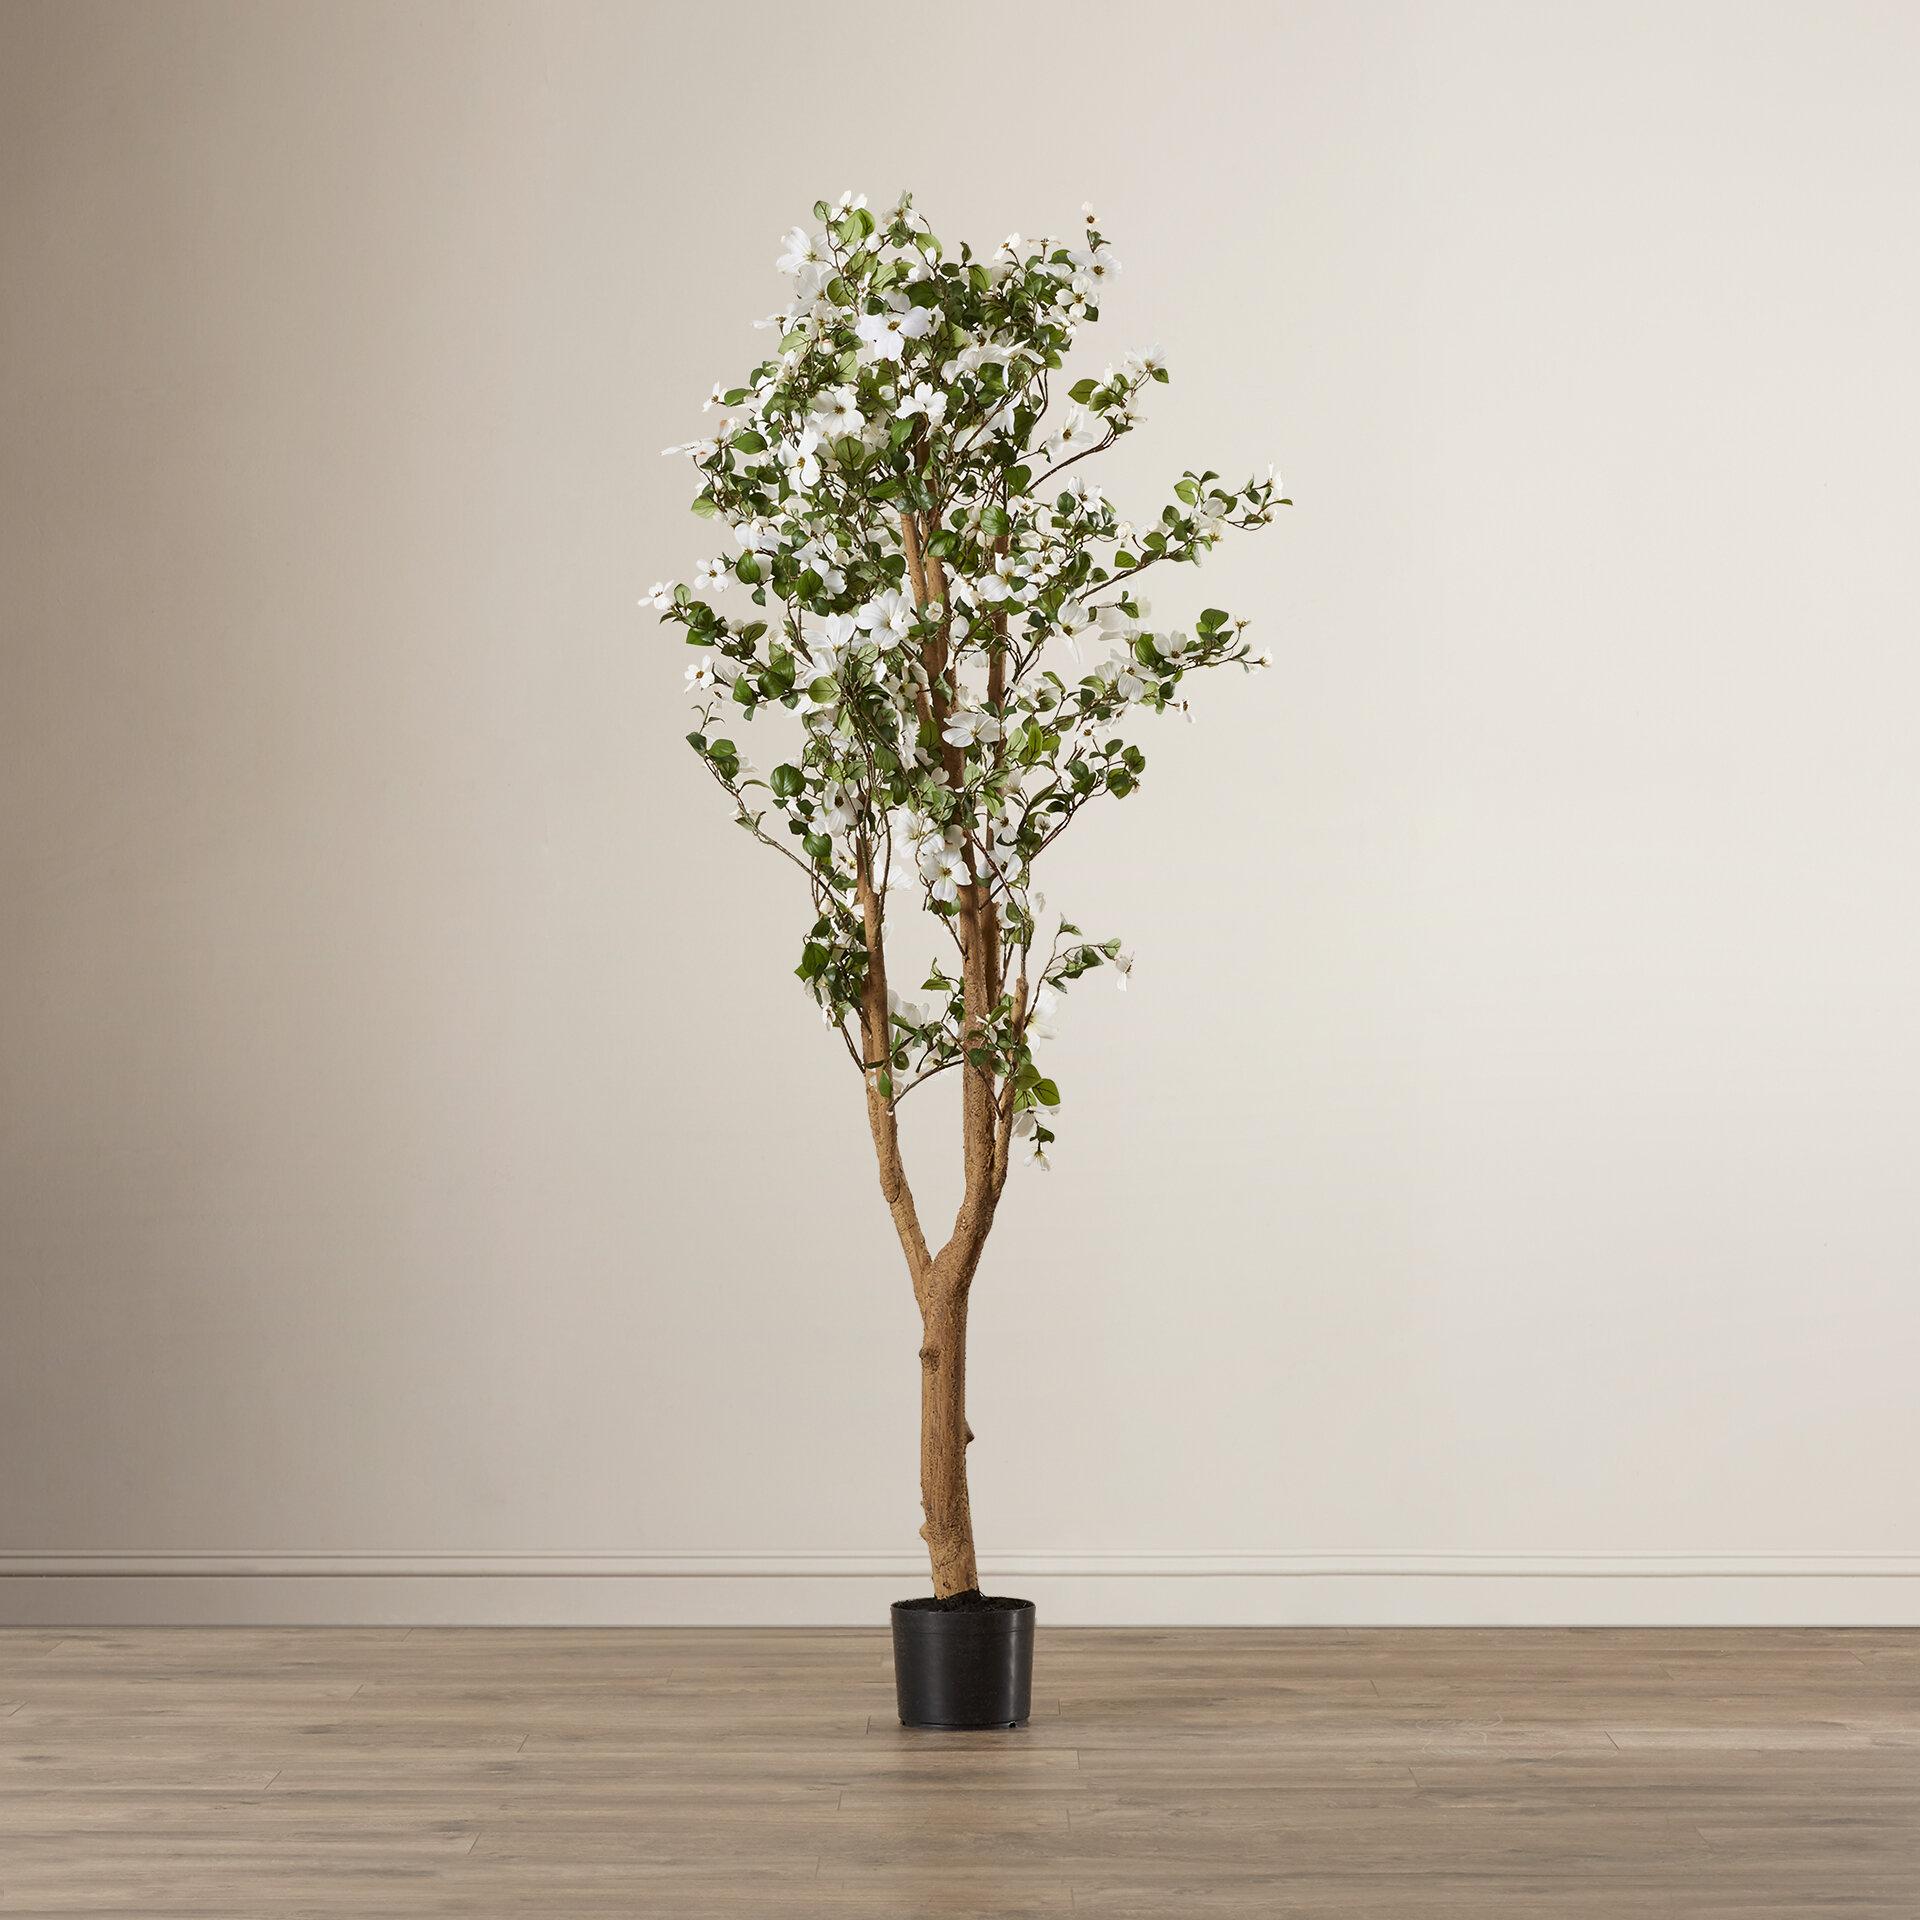 Red barrel studio silk dogwood tree in pot reviews wayfair mightylinksfo